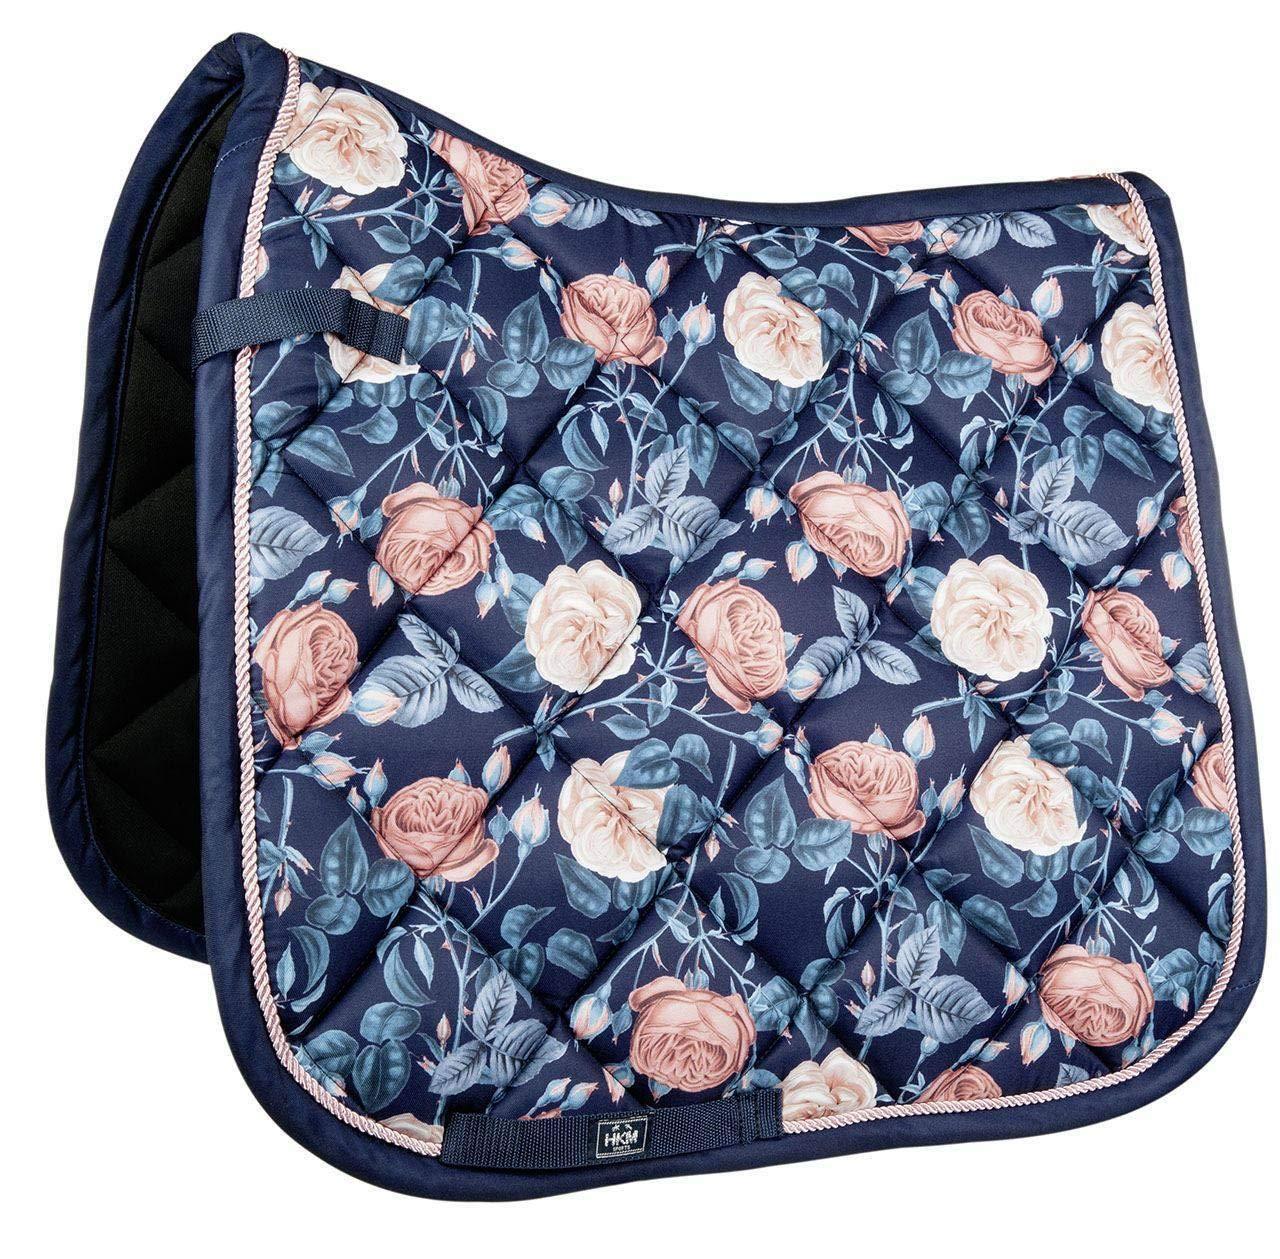 Hkm Hkm 4057052233500 Flowerpower-6947 Saddle Cloth Dark bluee Apricot Dress